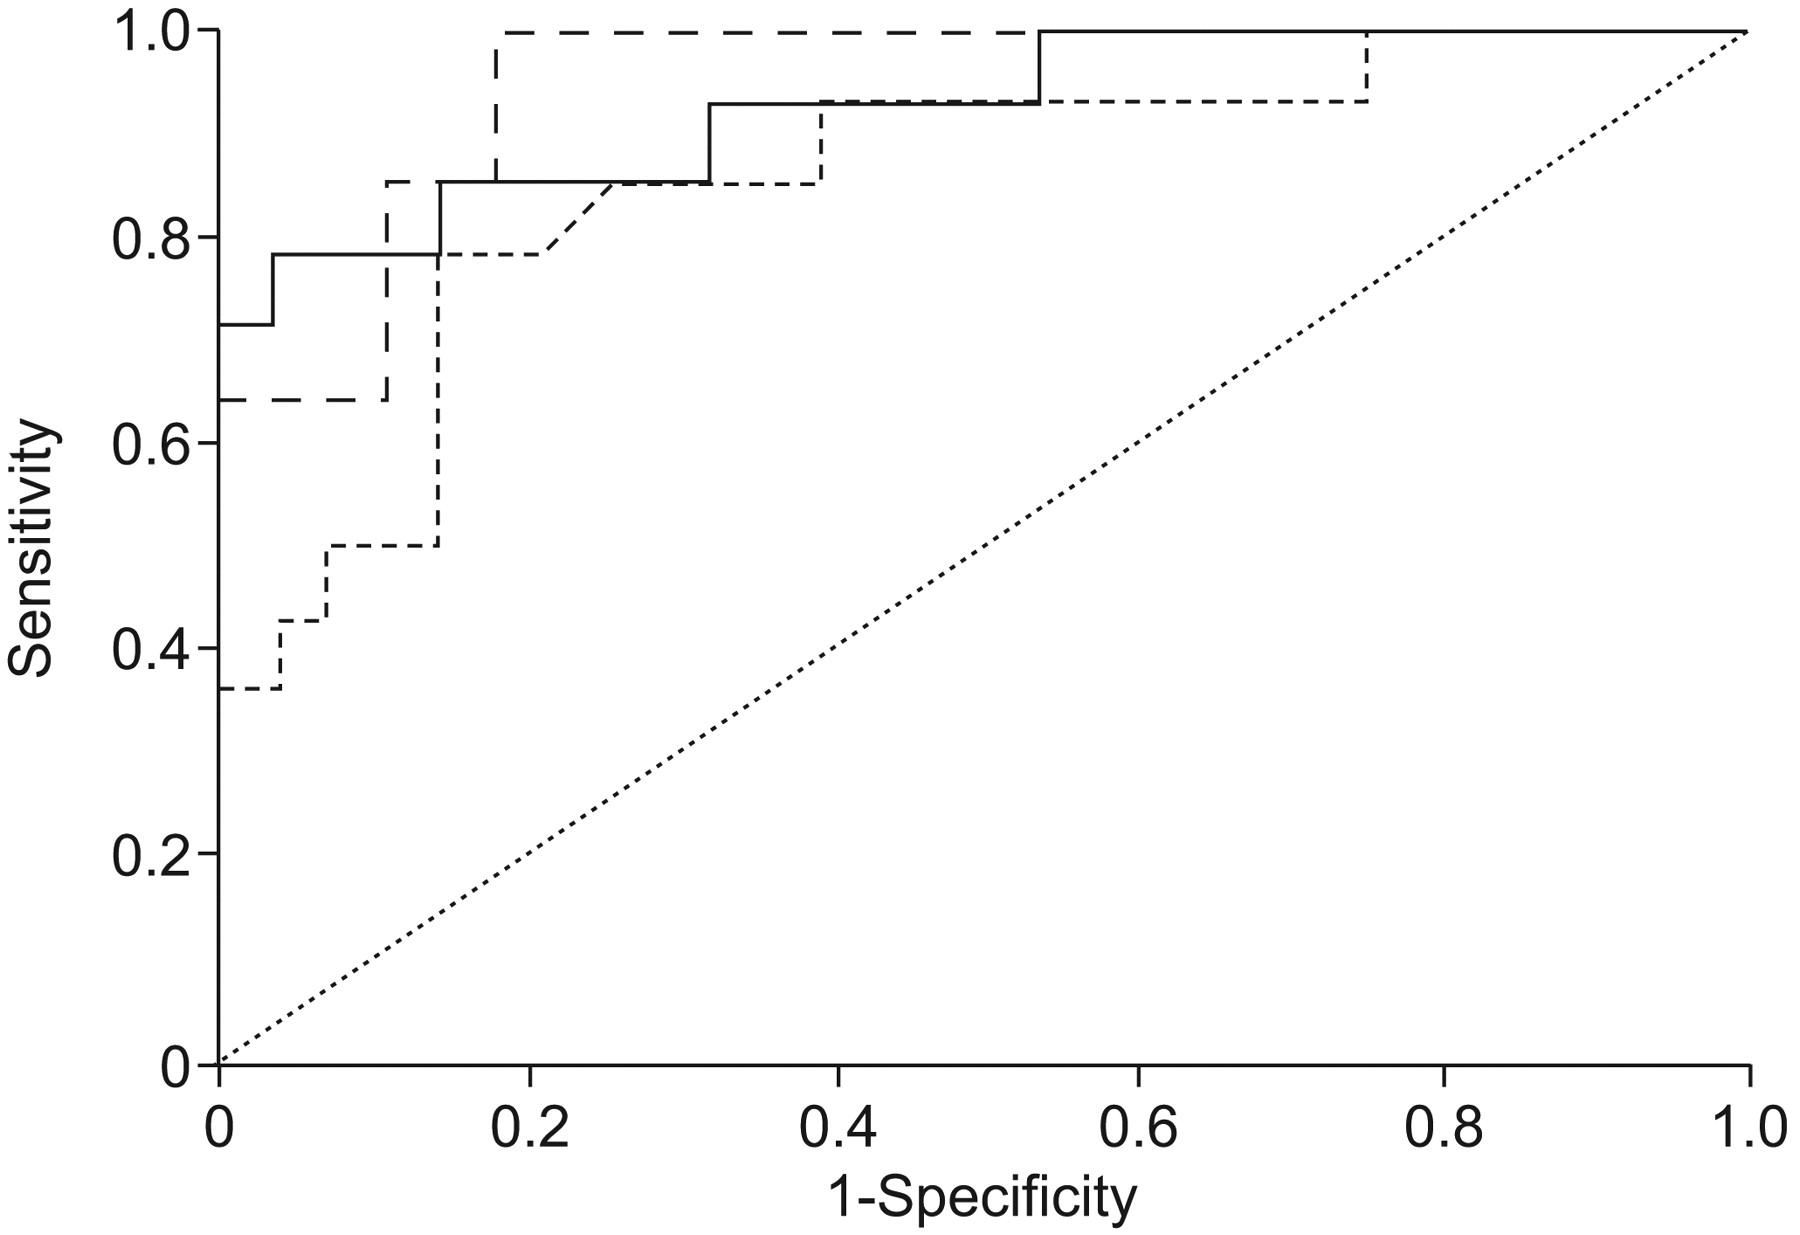 Plasma DNA level in predicting therapeutic efficacy in